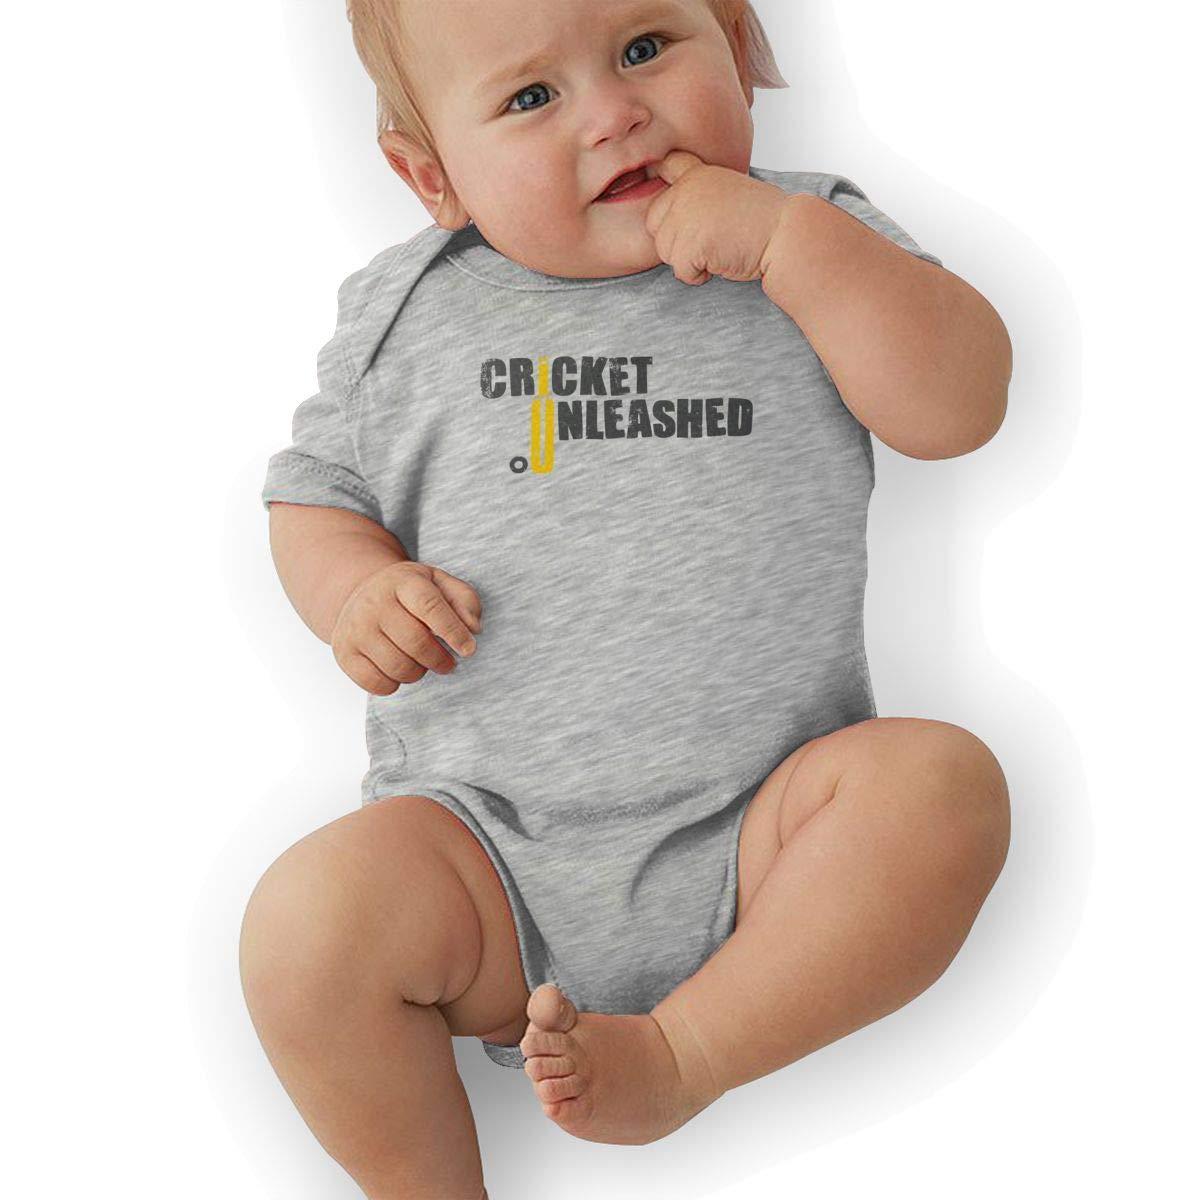 Newborn Baby Girls Bodysuit Short-Sleeve Onesie Cricket Unleashed Print Outfit Summer Pajamas